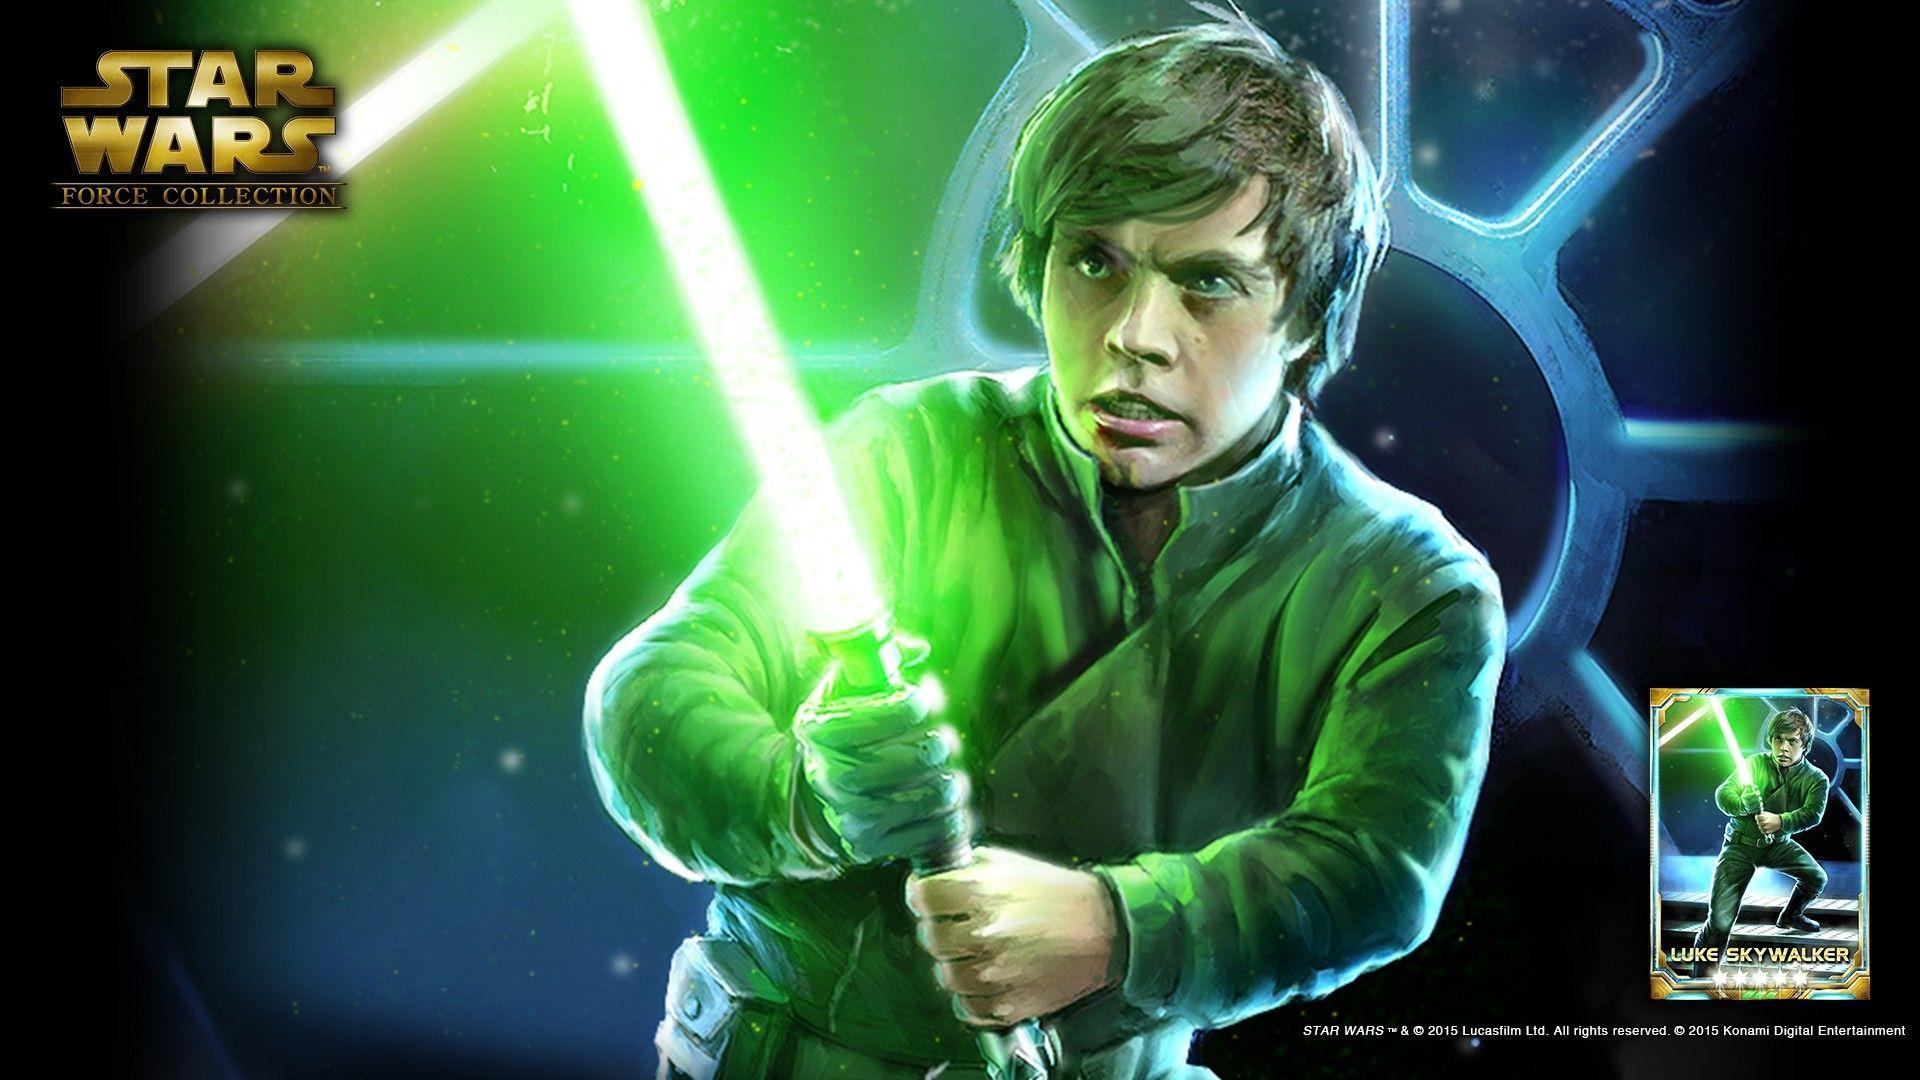 Star Wars Luke Skywalker Wallpapers Top Free Star Wars Luke Skywalker Backgrounds Wallpaperaccess